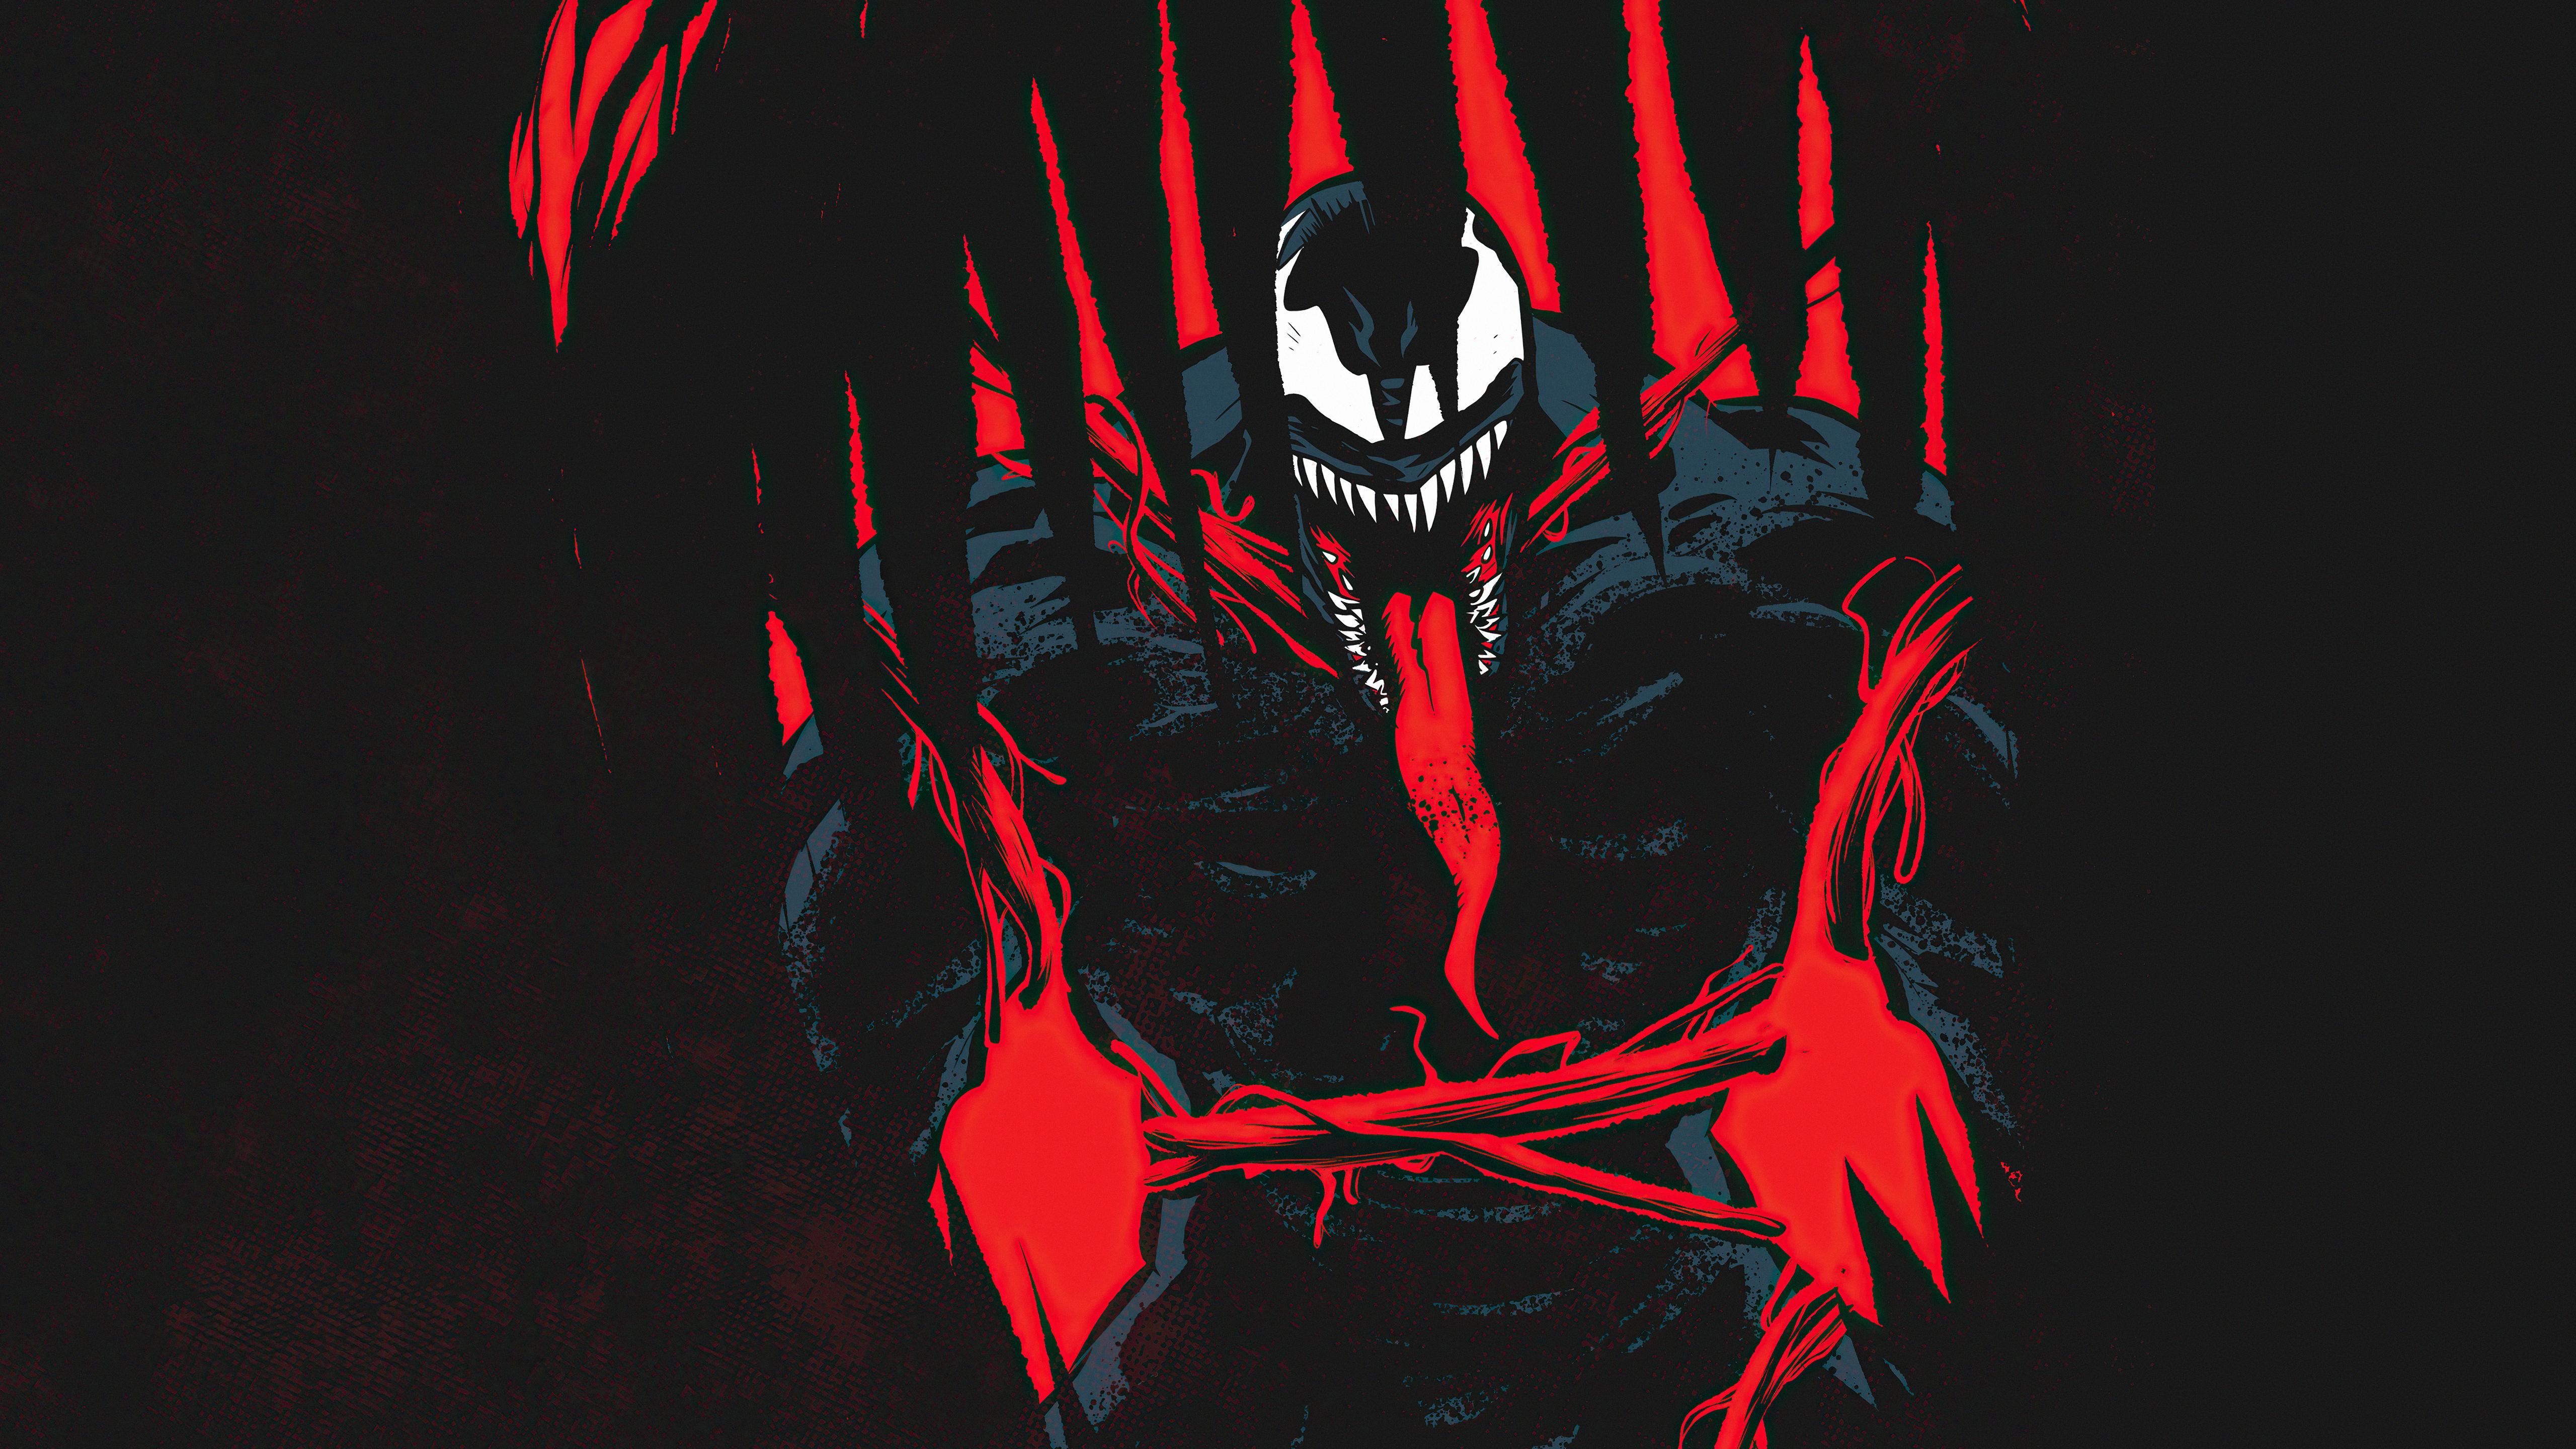 venom let there carnage 4k 1629771506 - Venom Let There Carnage 4k - Wallpapers, Venom Let There Carnage wallpapers, Venom Let There Carnage 4k